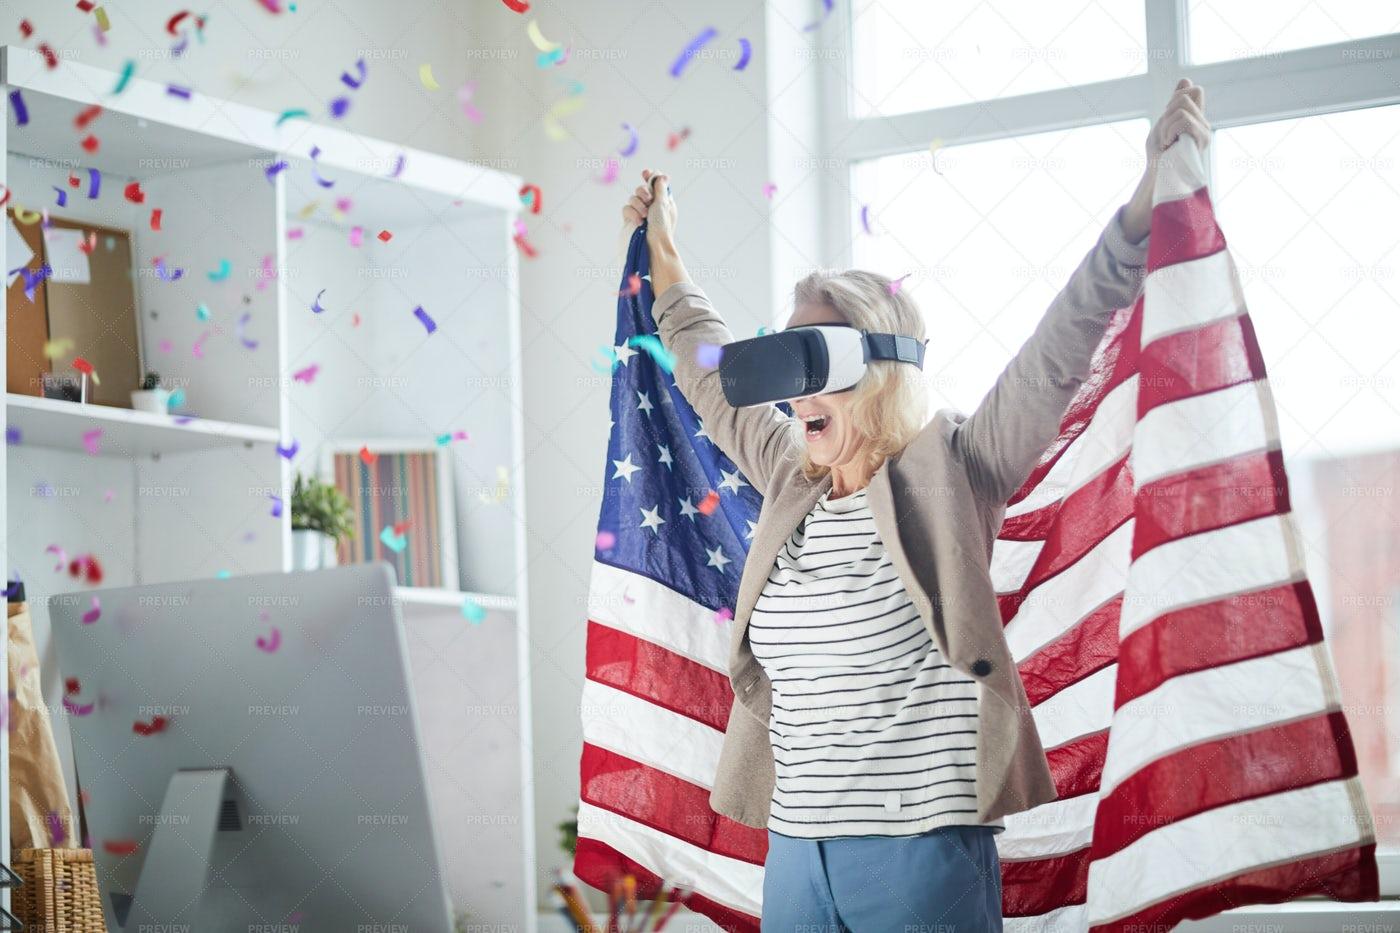 Fan Cheering In VR: Stock Photos